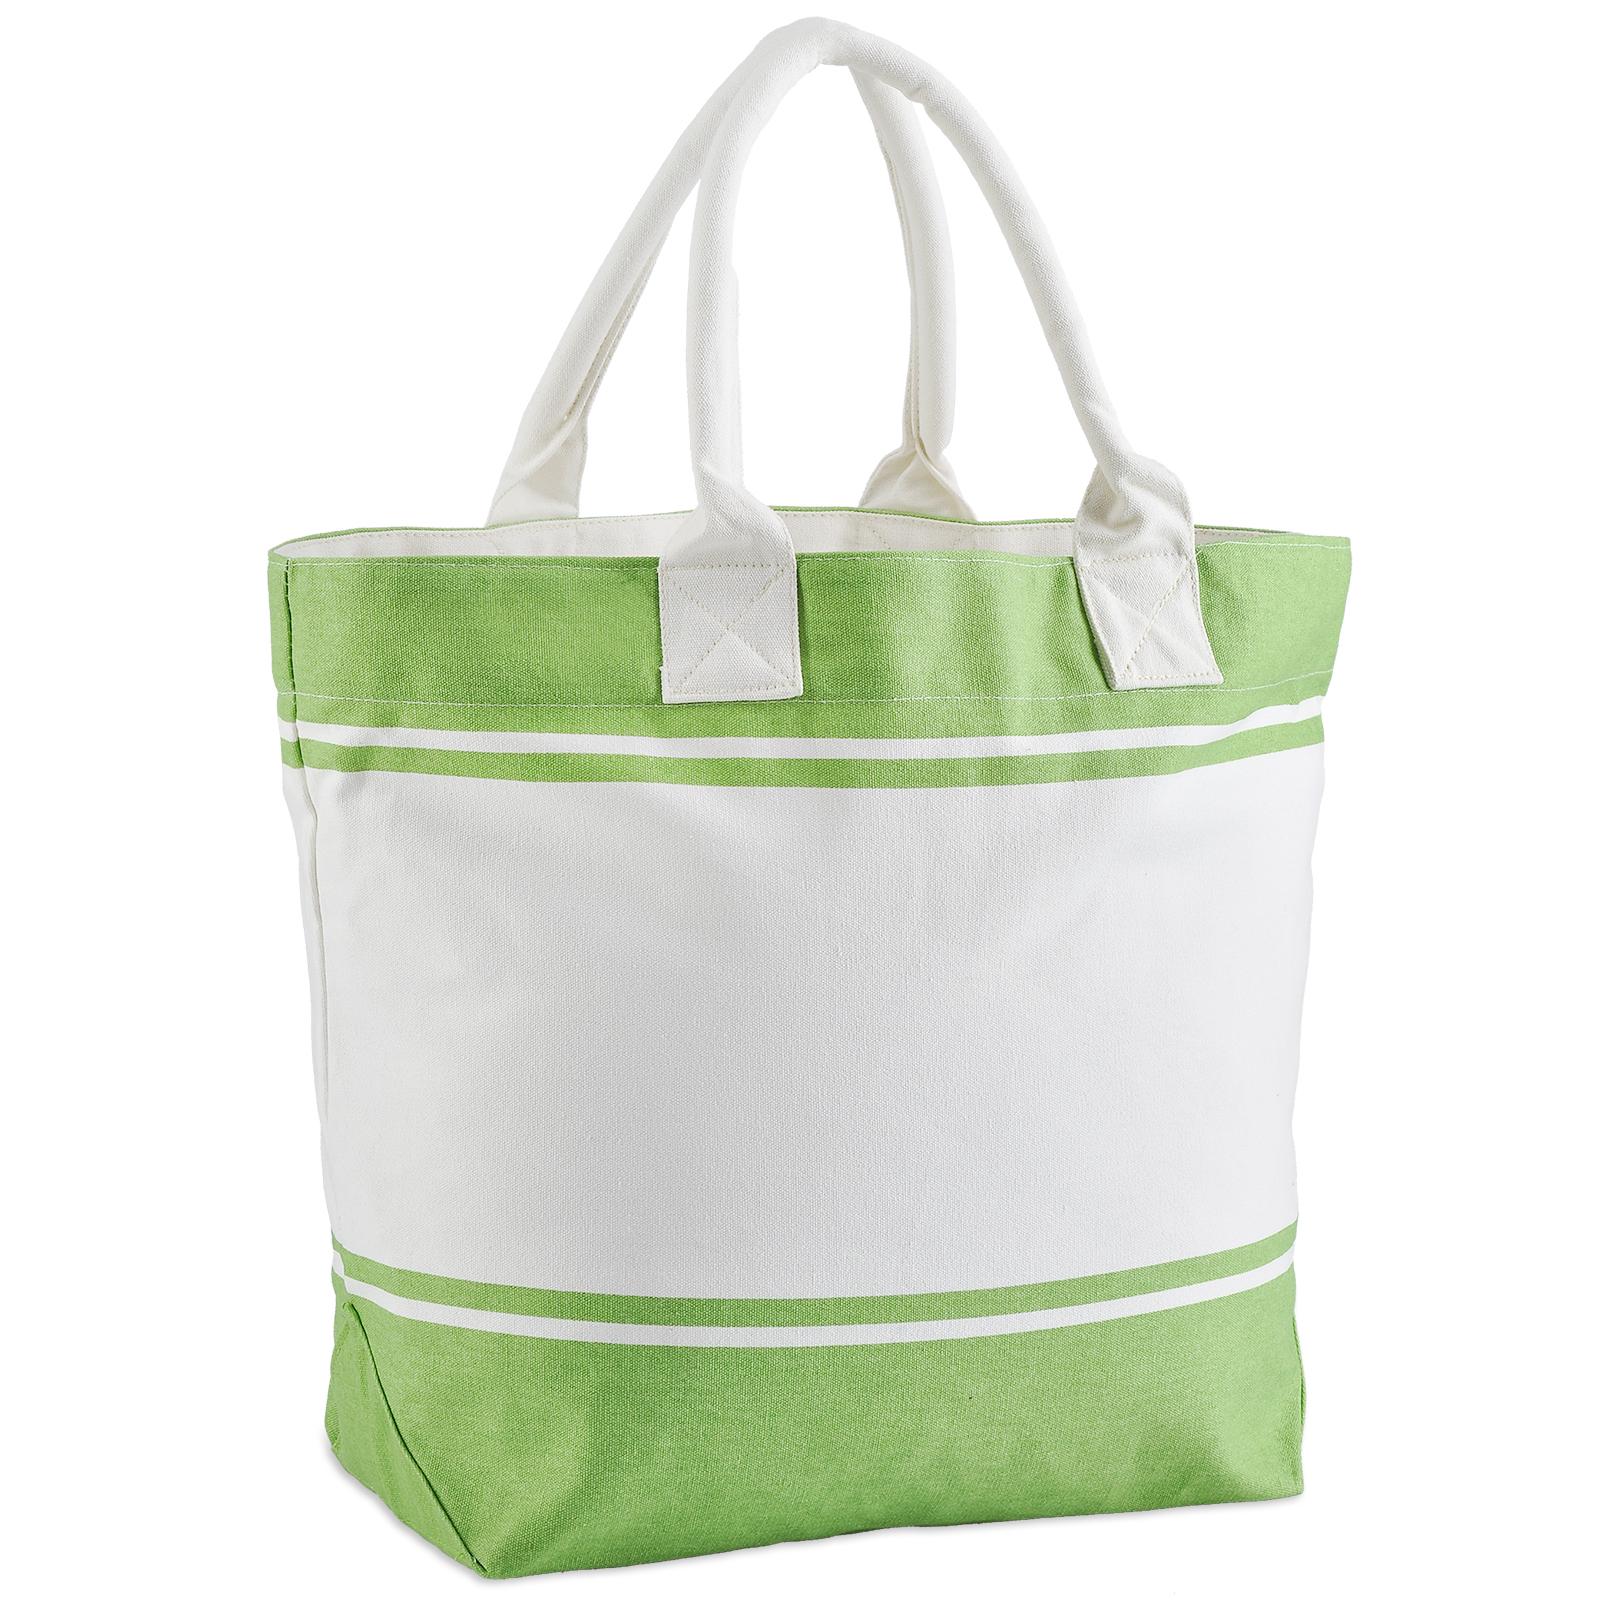 sac-plage-fourre-tout-vert-MQ-00064-F16